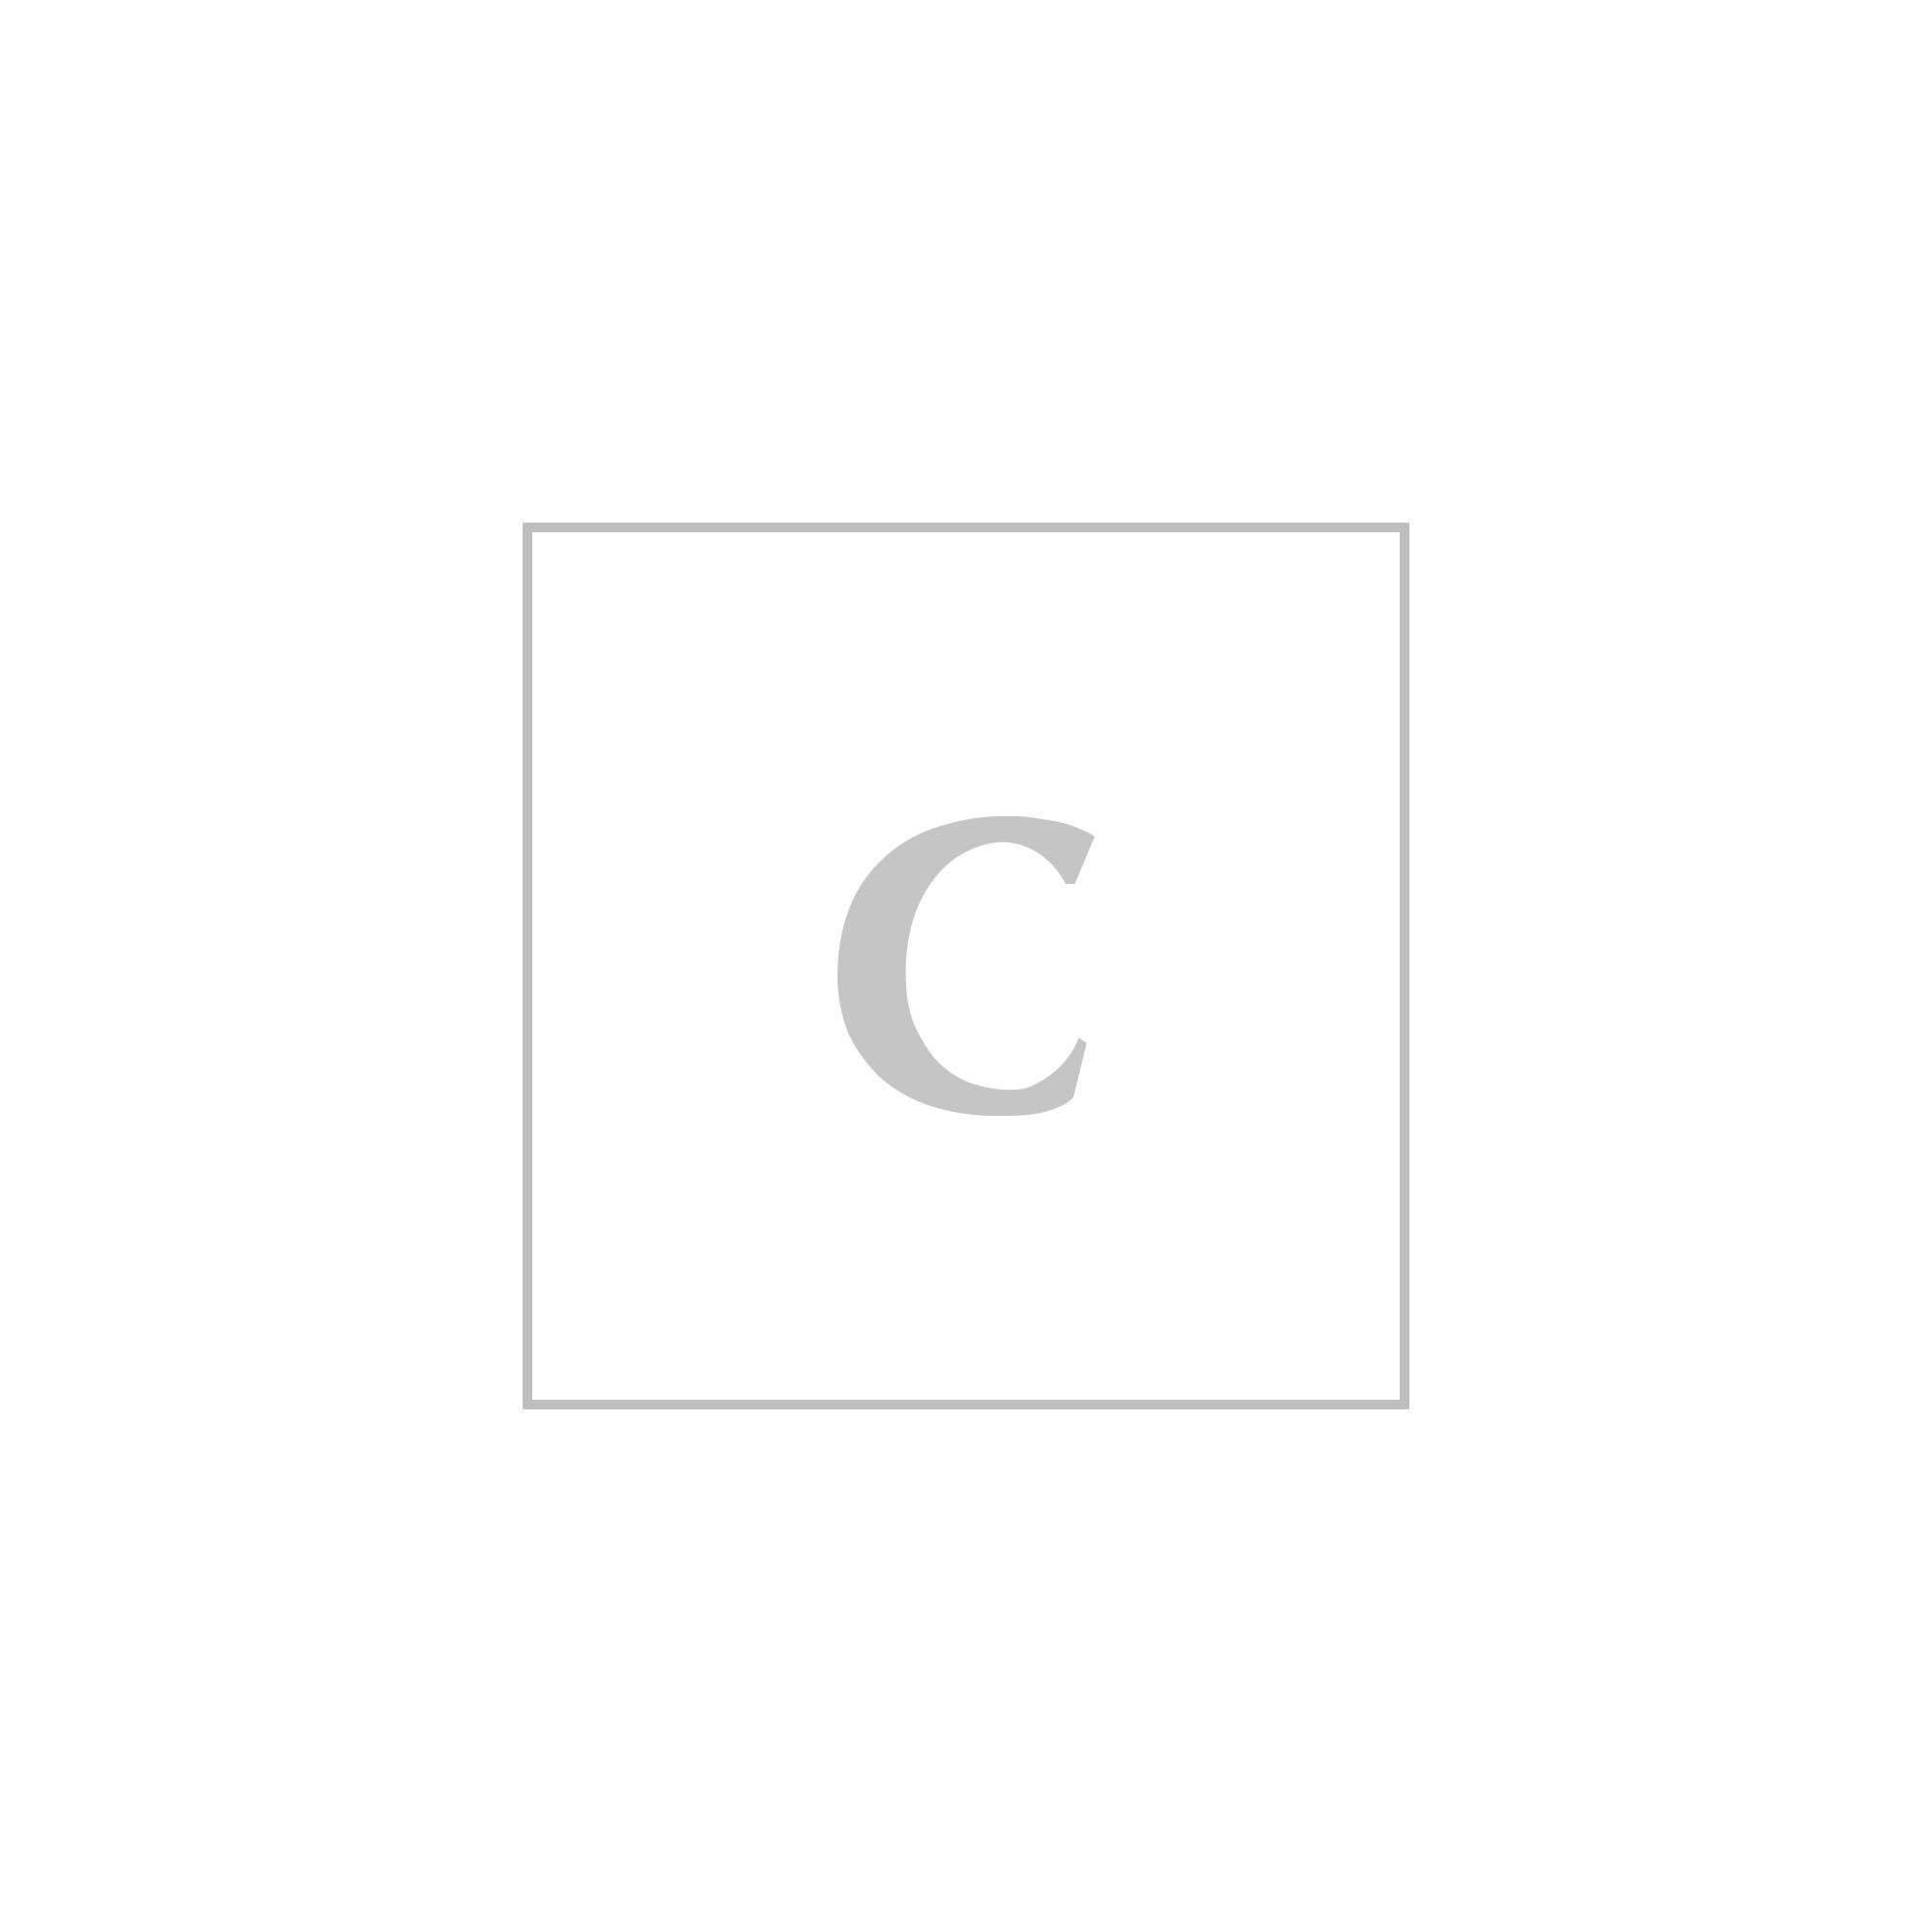 info for 56929 be3e1 pantaloni calvin-klein-205w39nyc grigio 182920upn000003-034-3.jpg